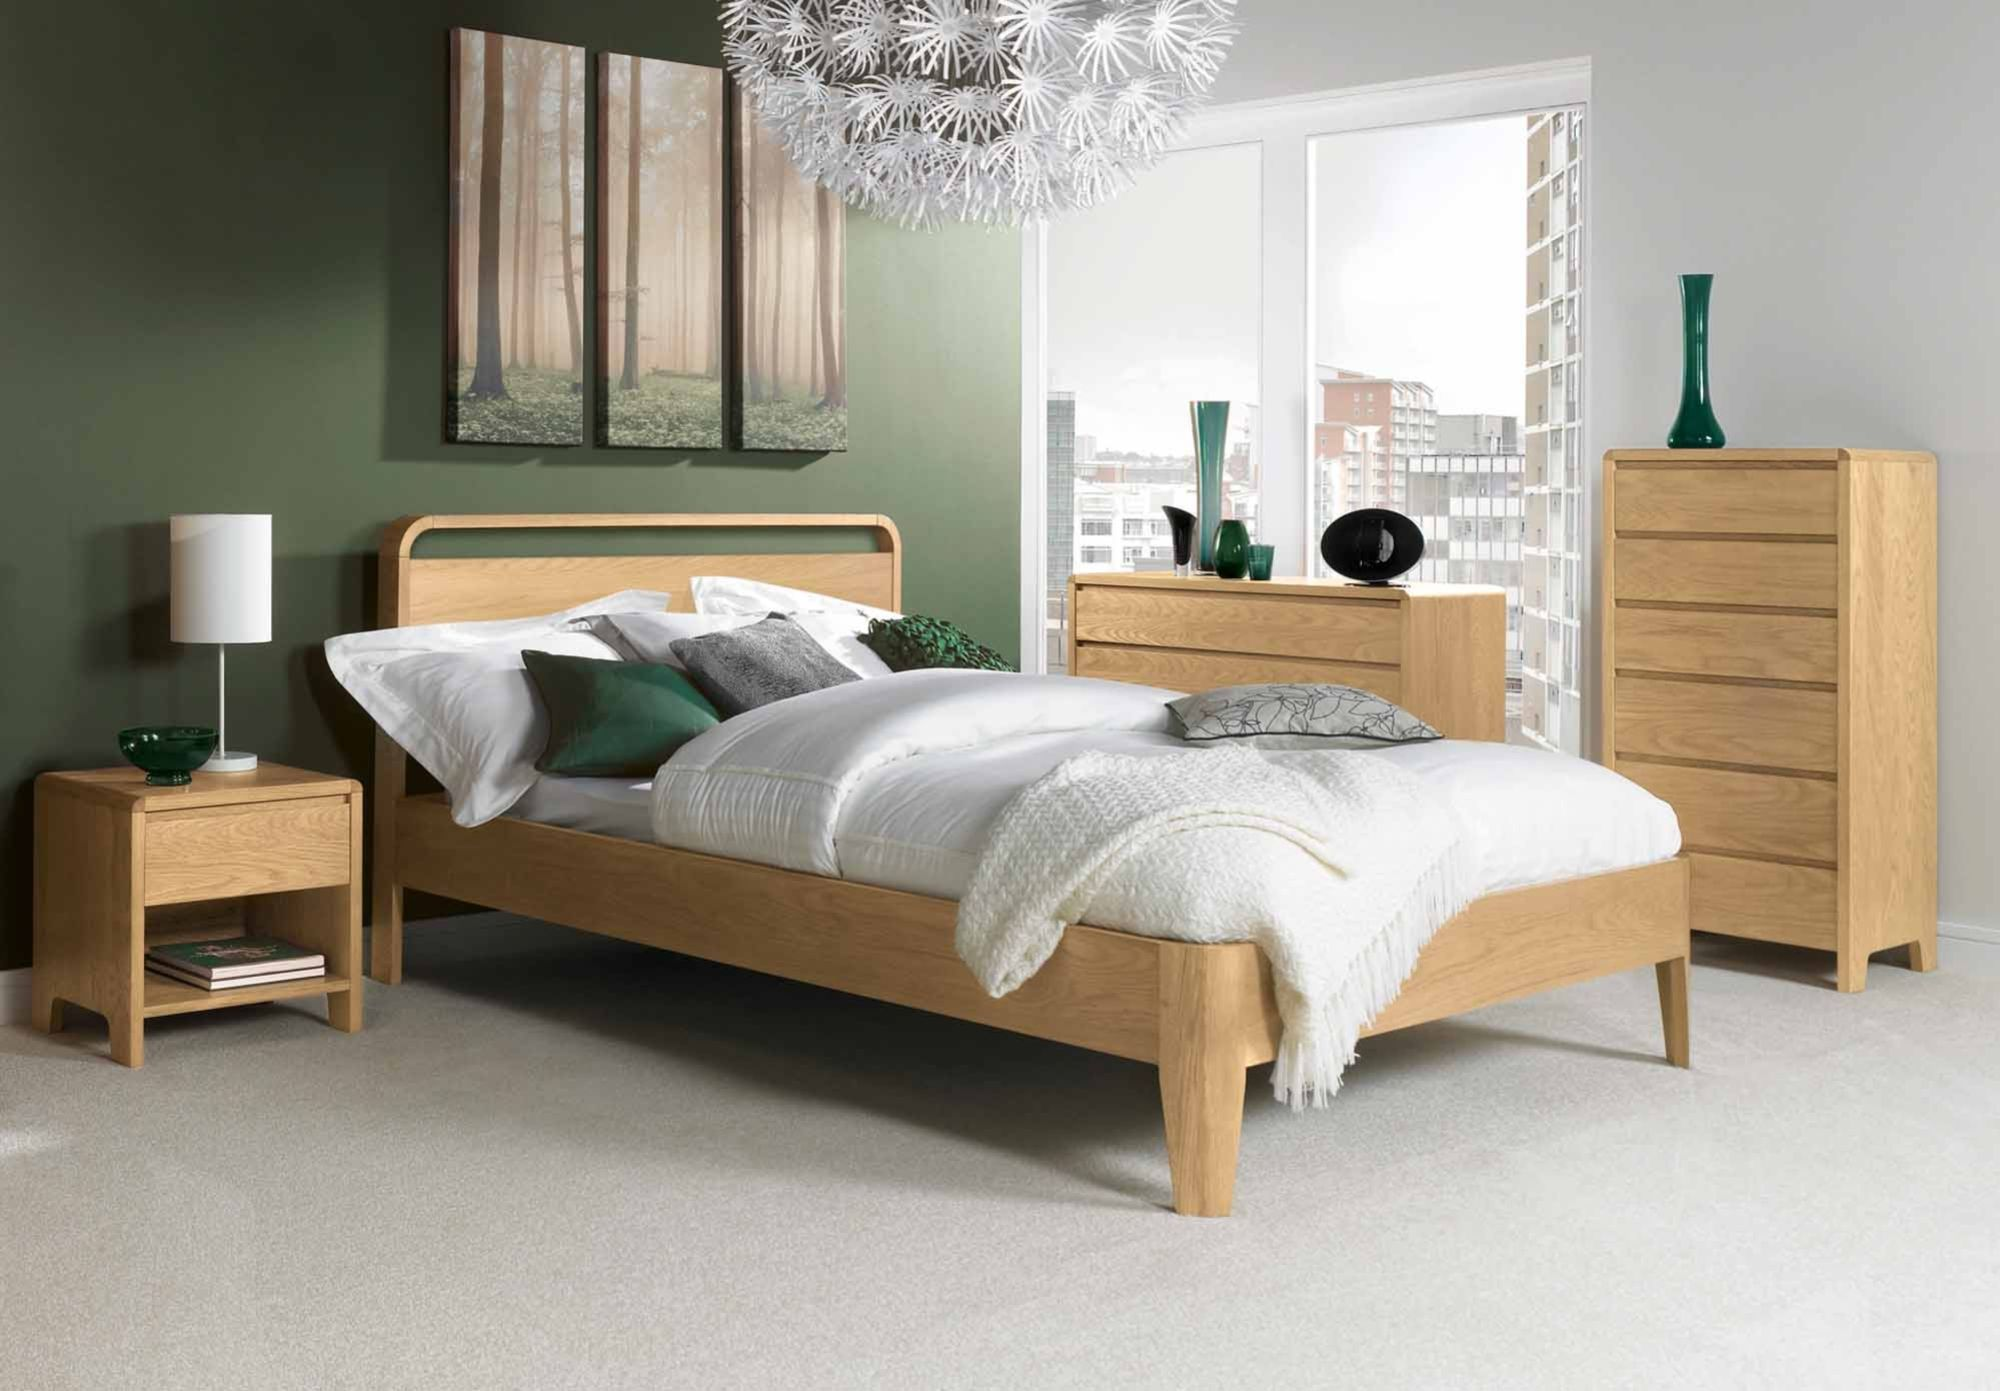 Bedroom Chairs Furniture Village Craftmaster Chair And A Half Monza Oak Psoriasisguru